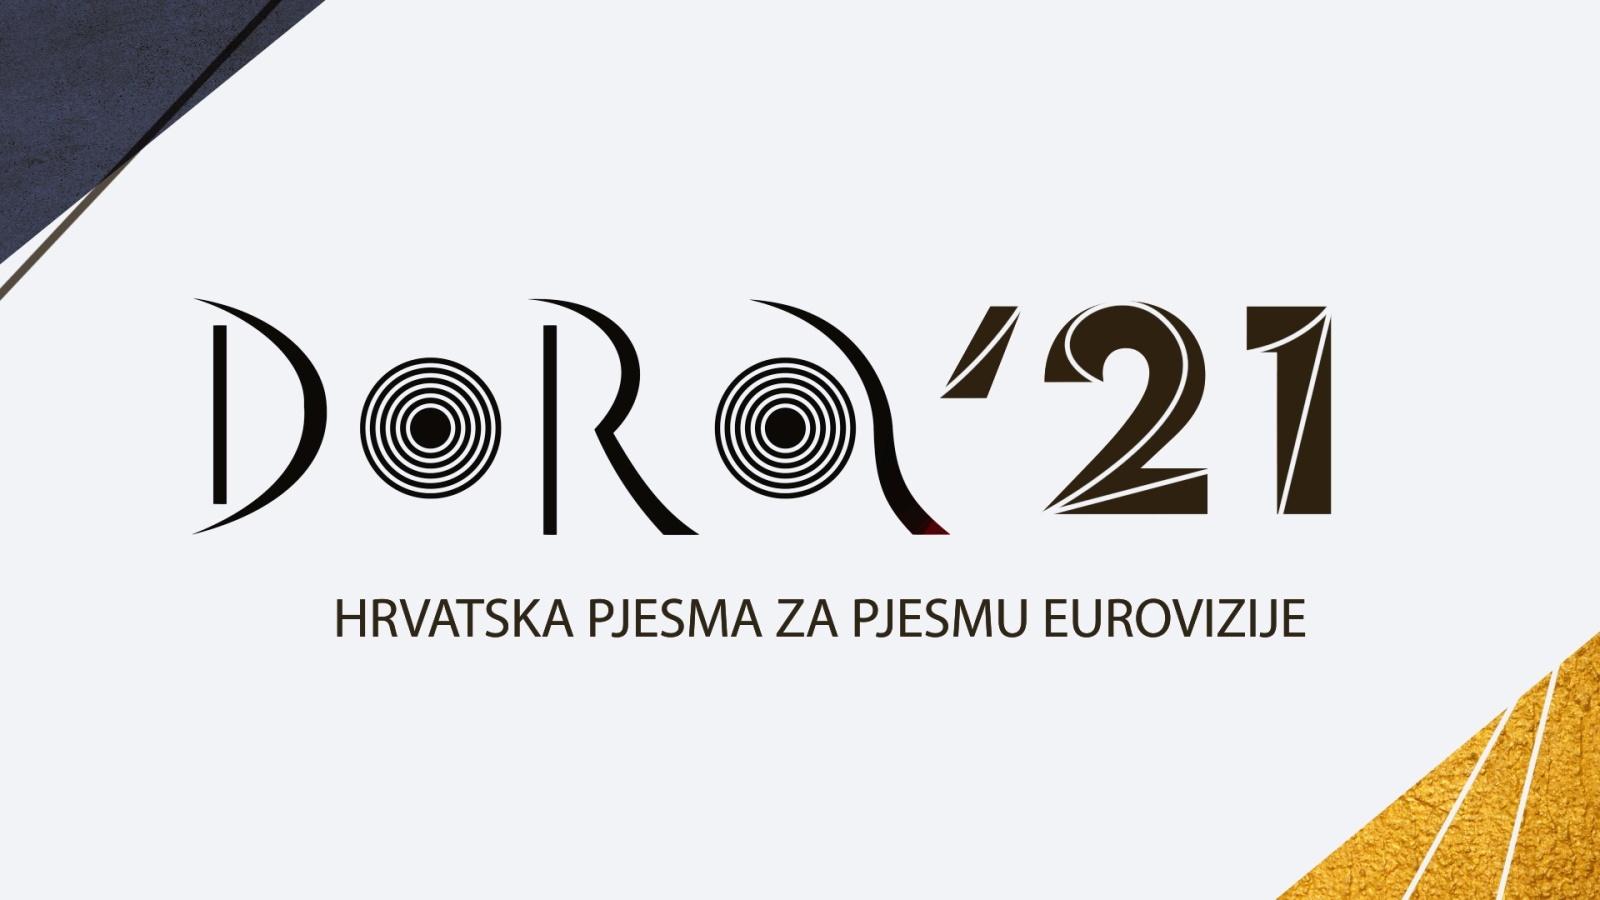 Dora 2021